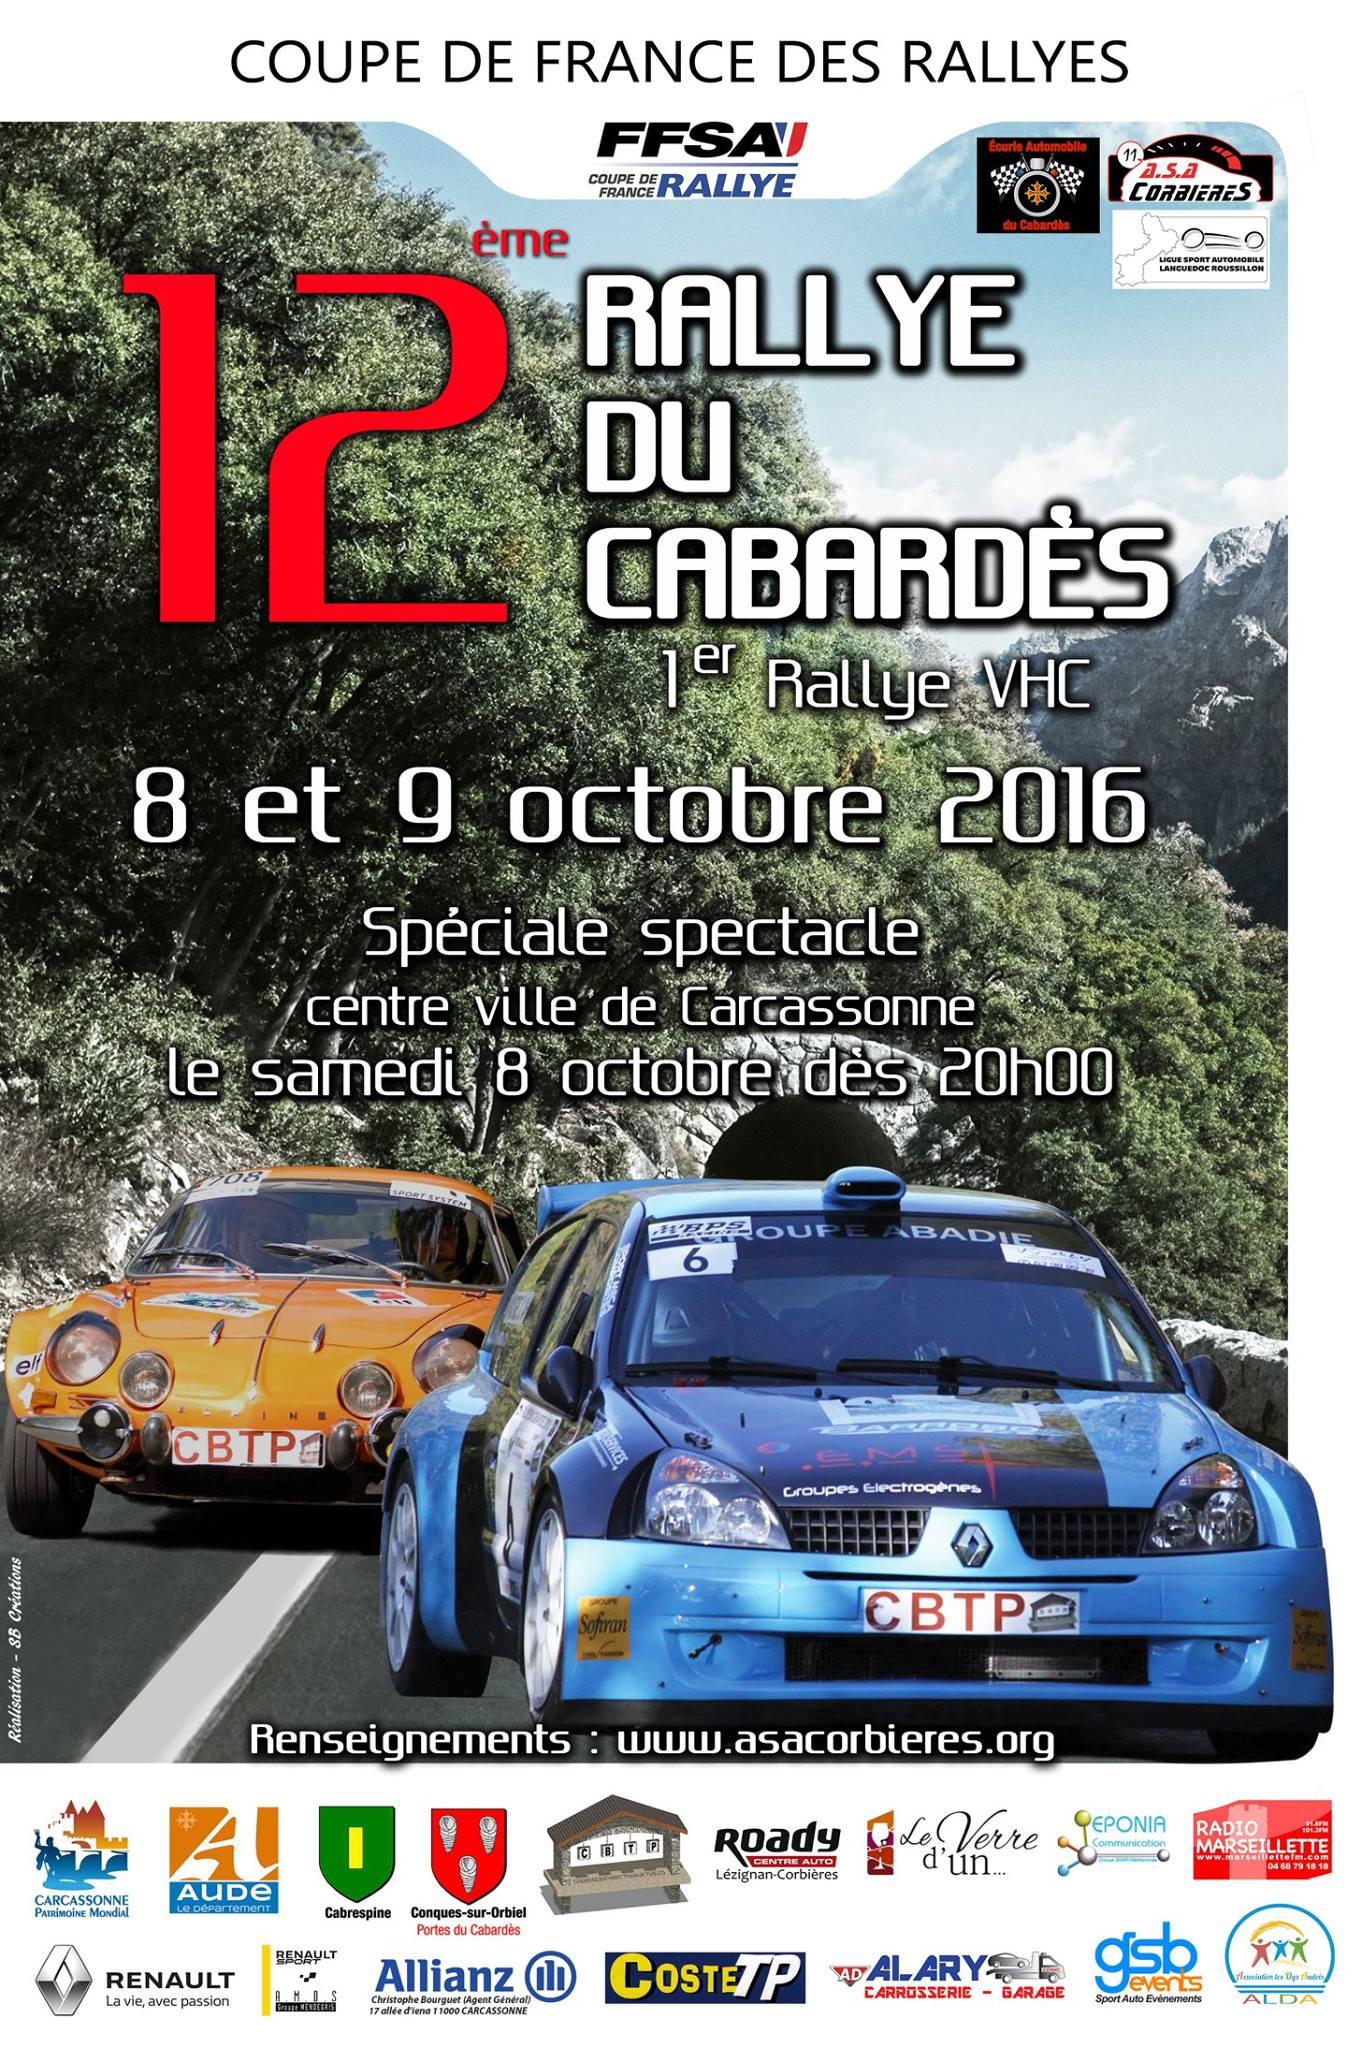 Rallye-du-Cabardes-2016